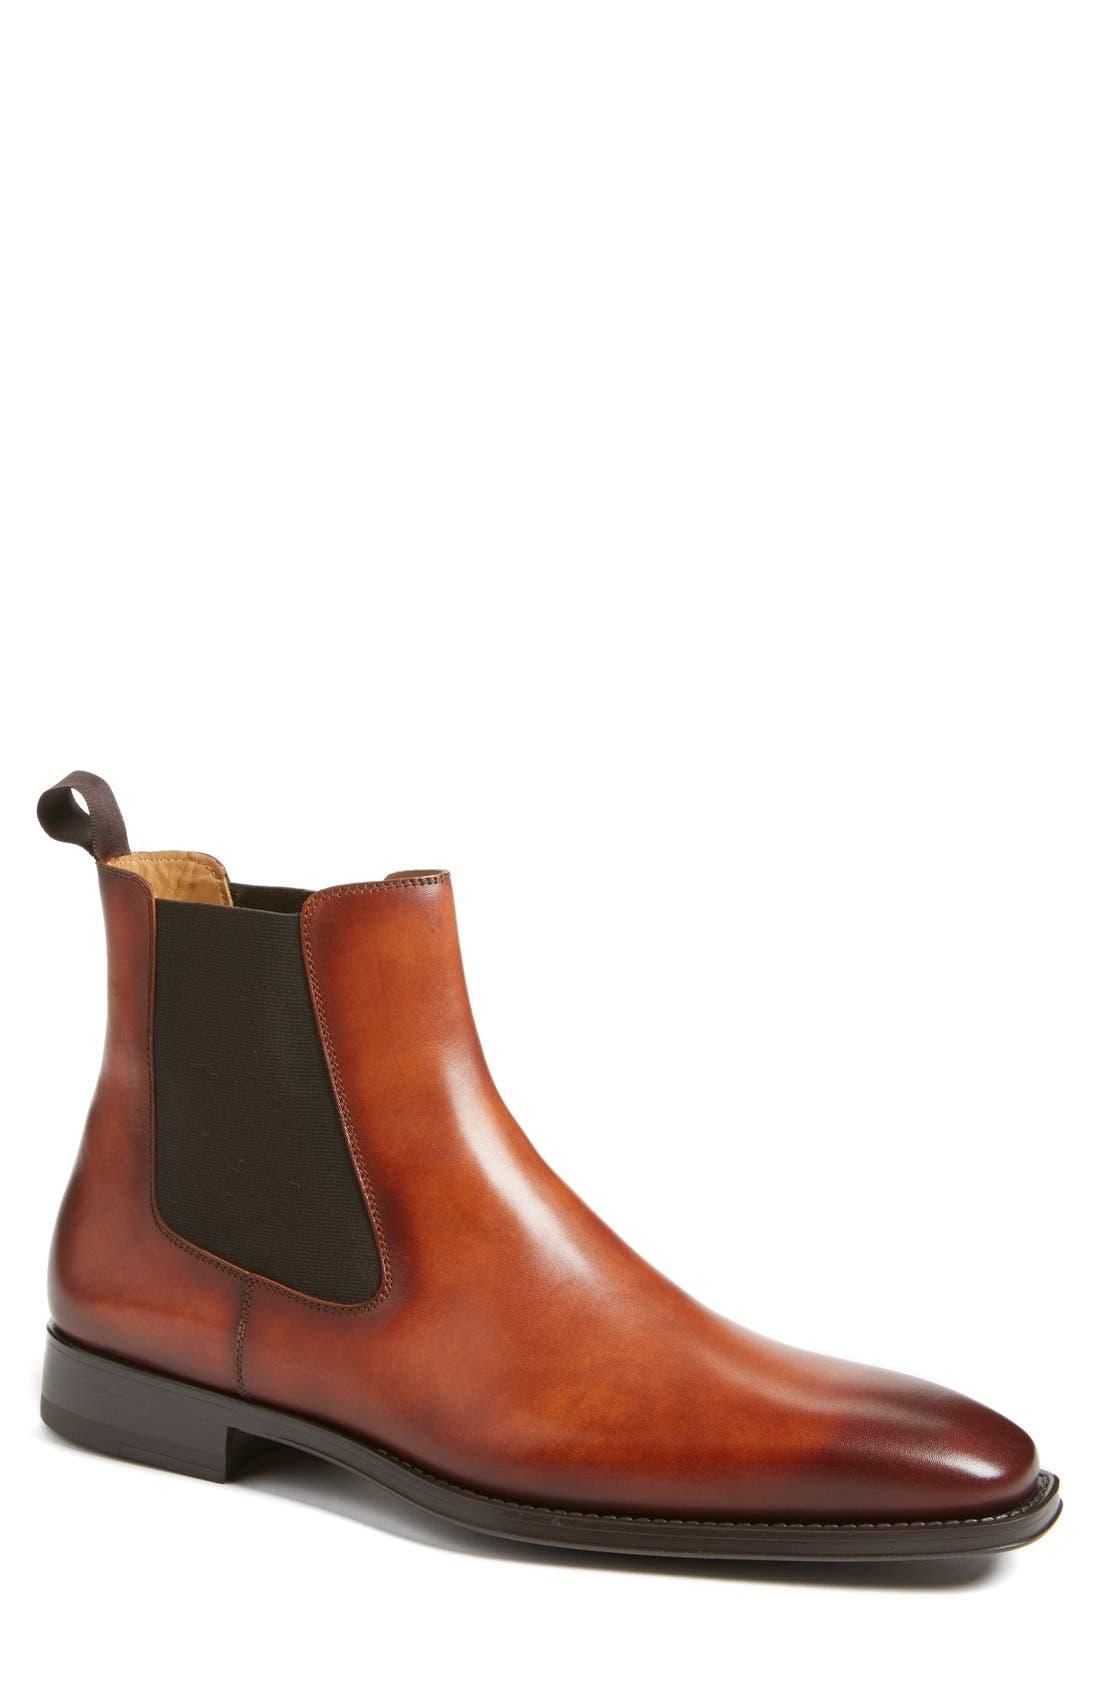 'Sean' Chelsea Boot,                             Main thumbnail 1, color,                             Cognac